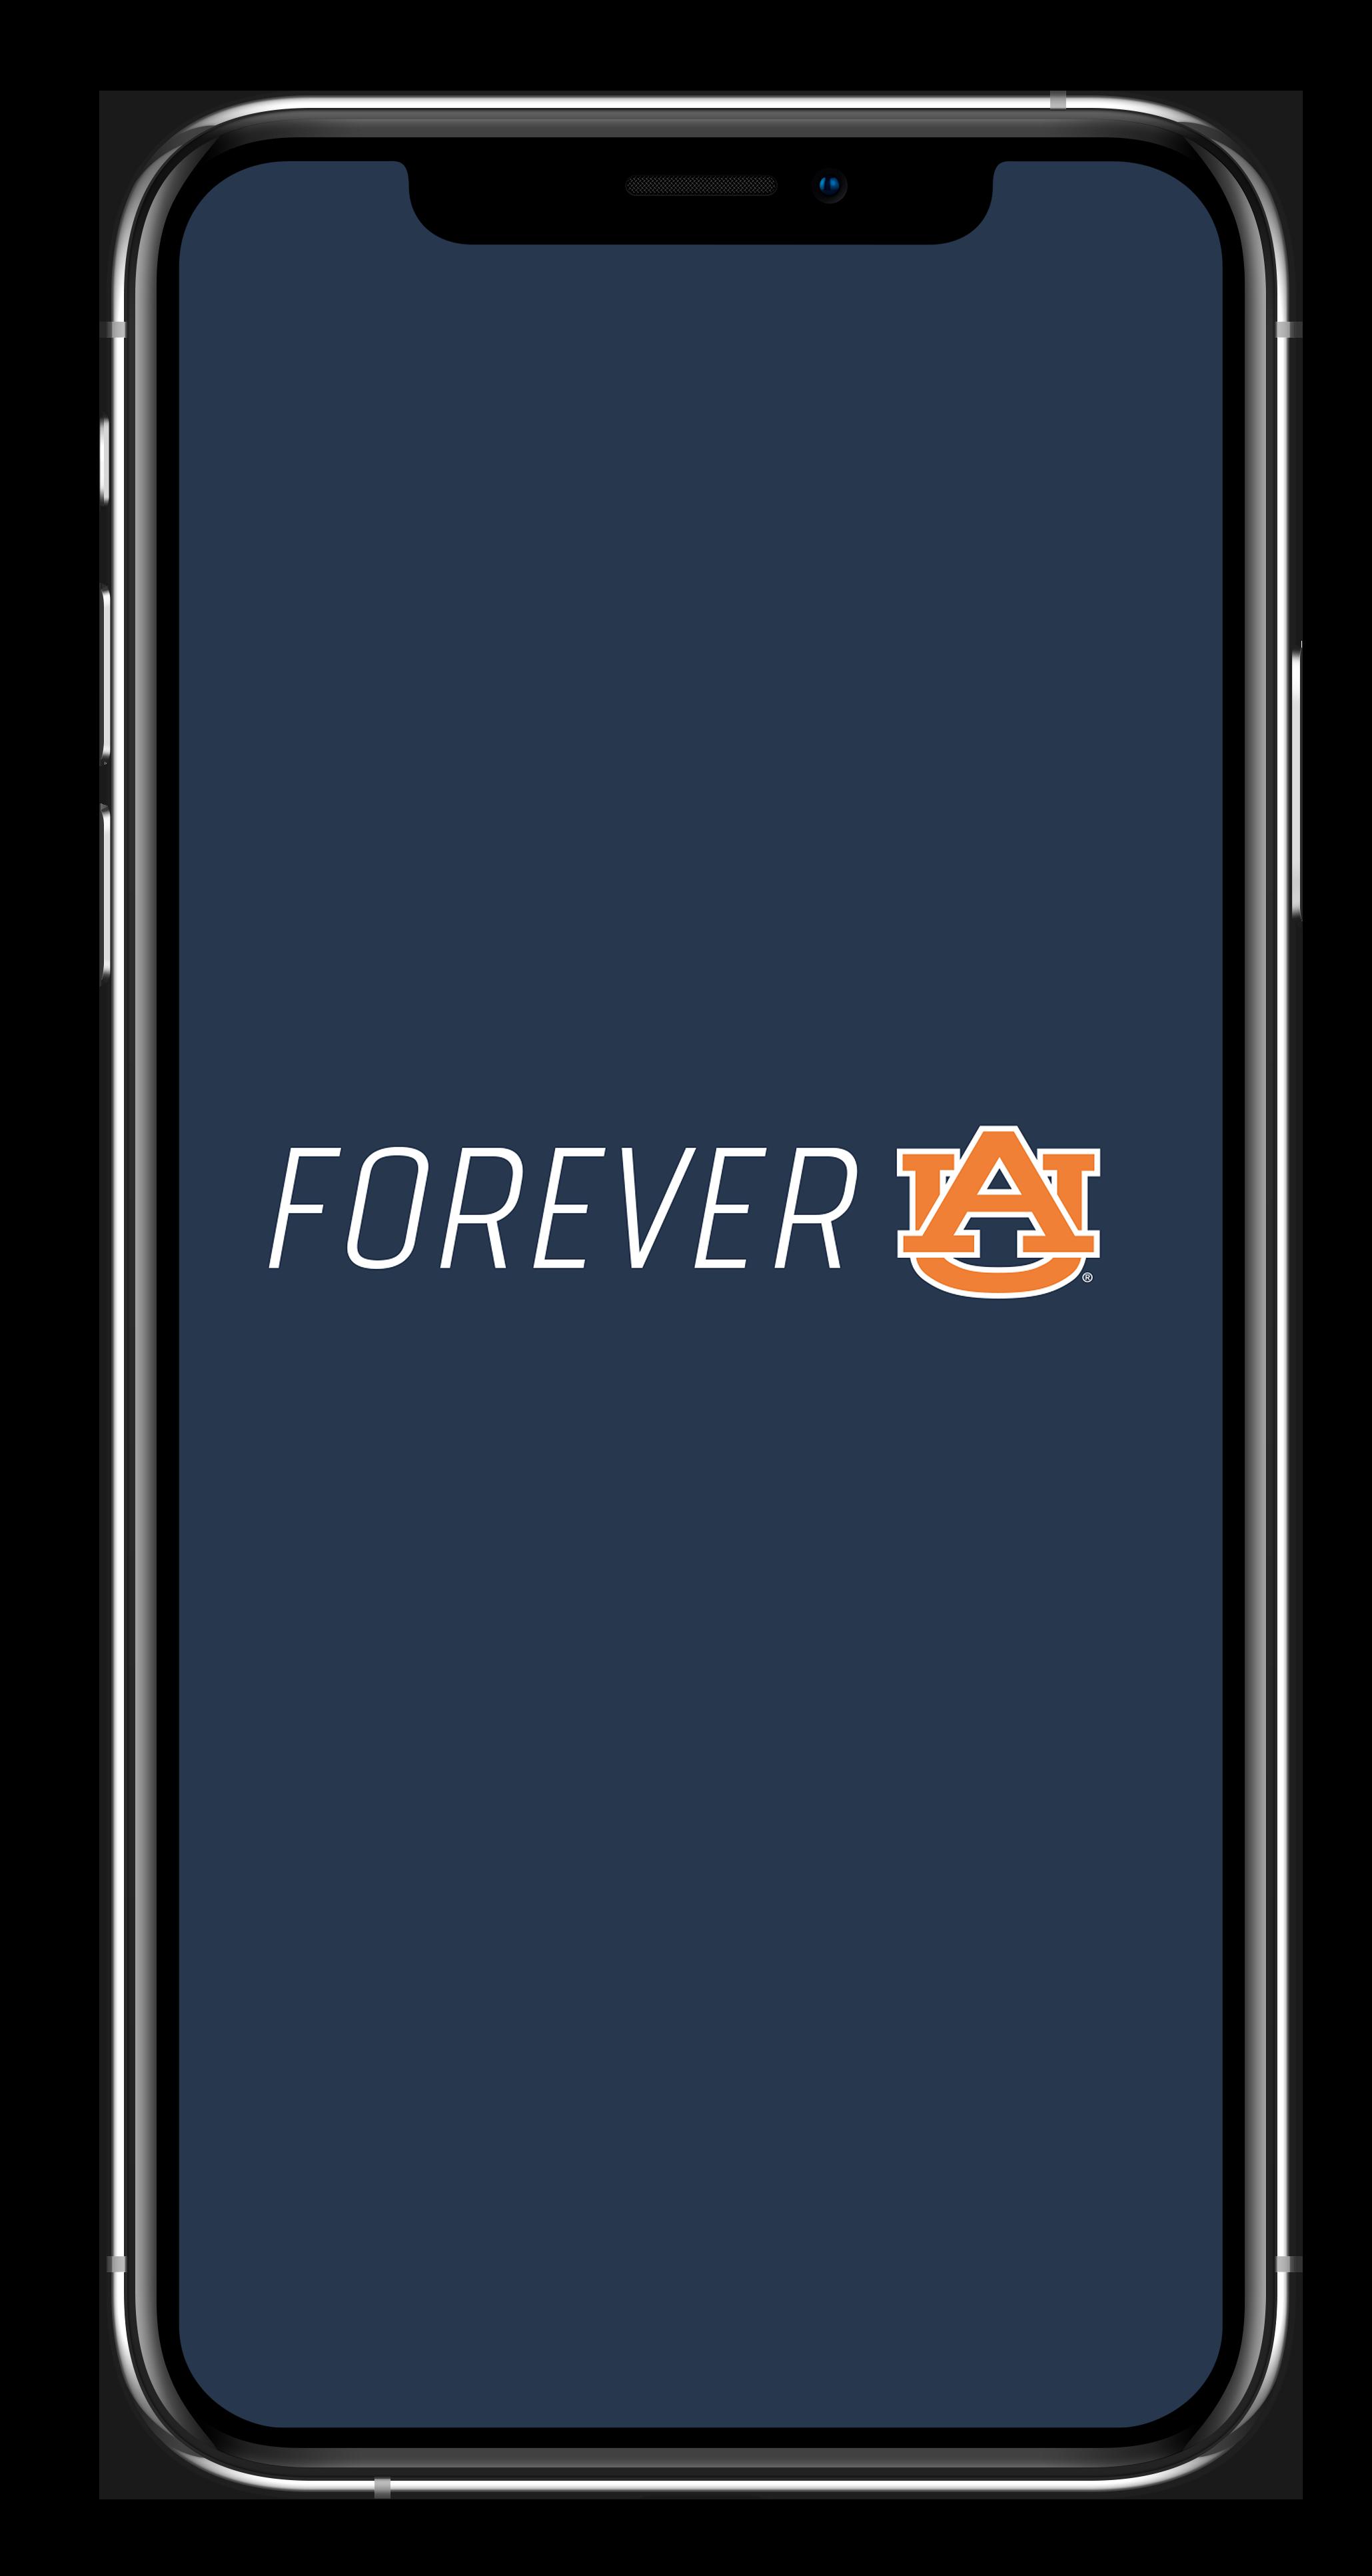 Forever AU phone app